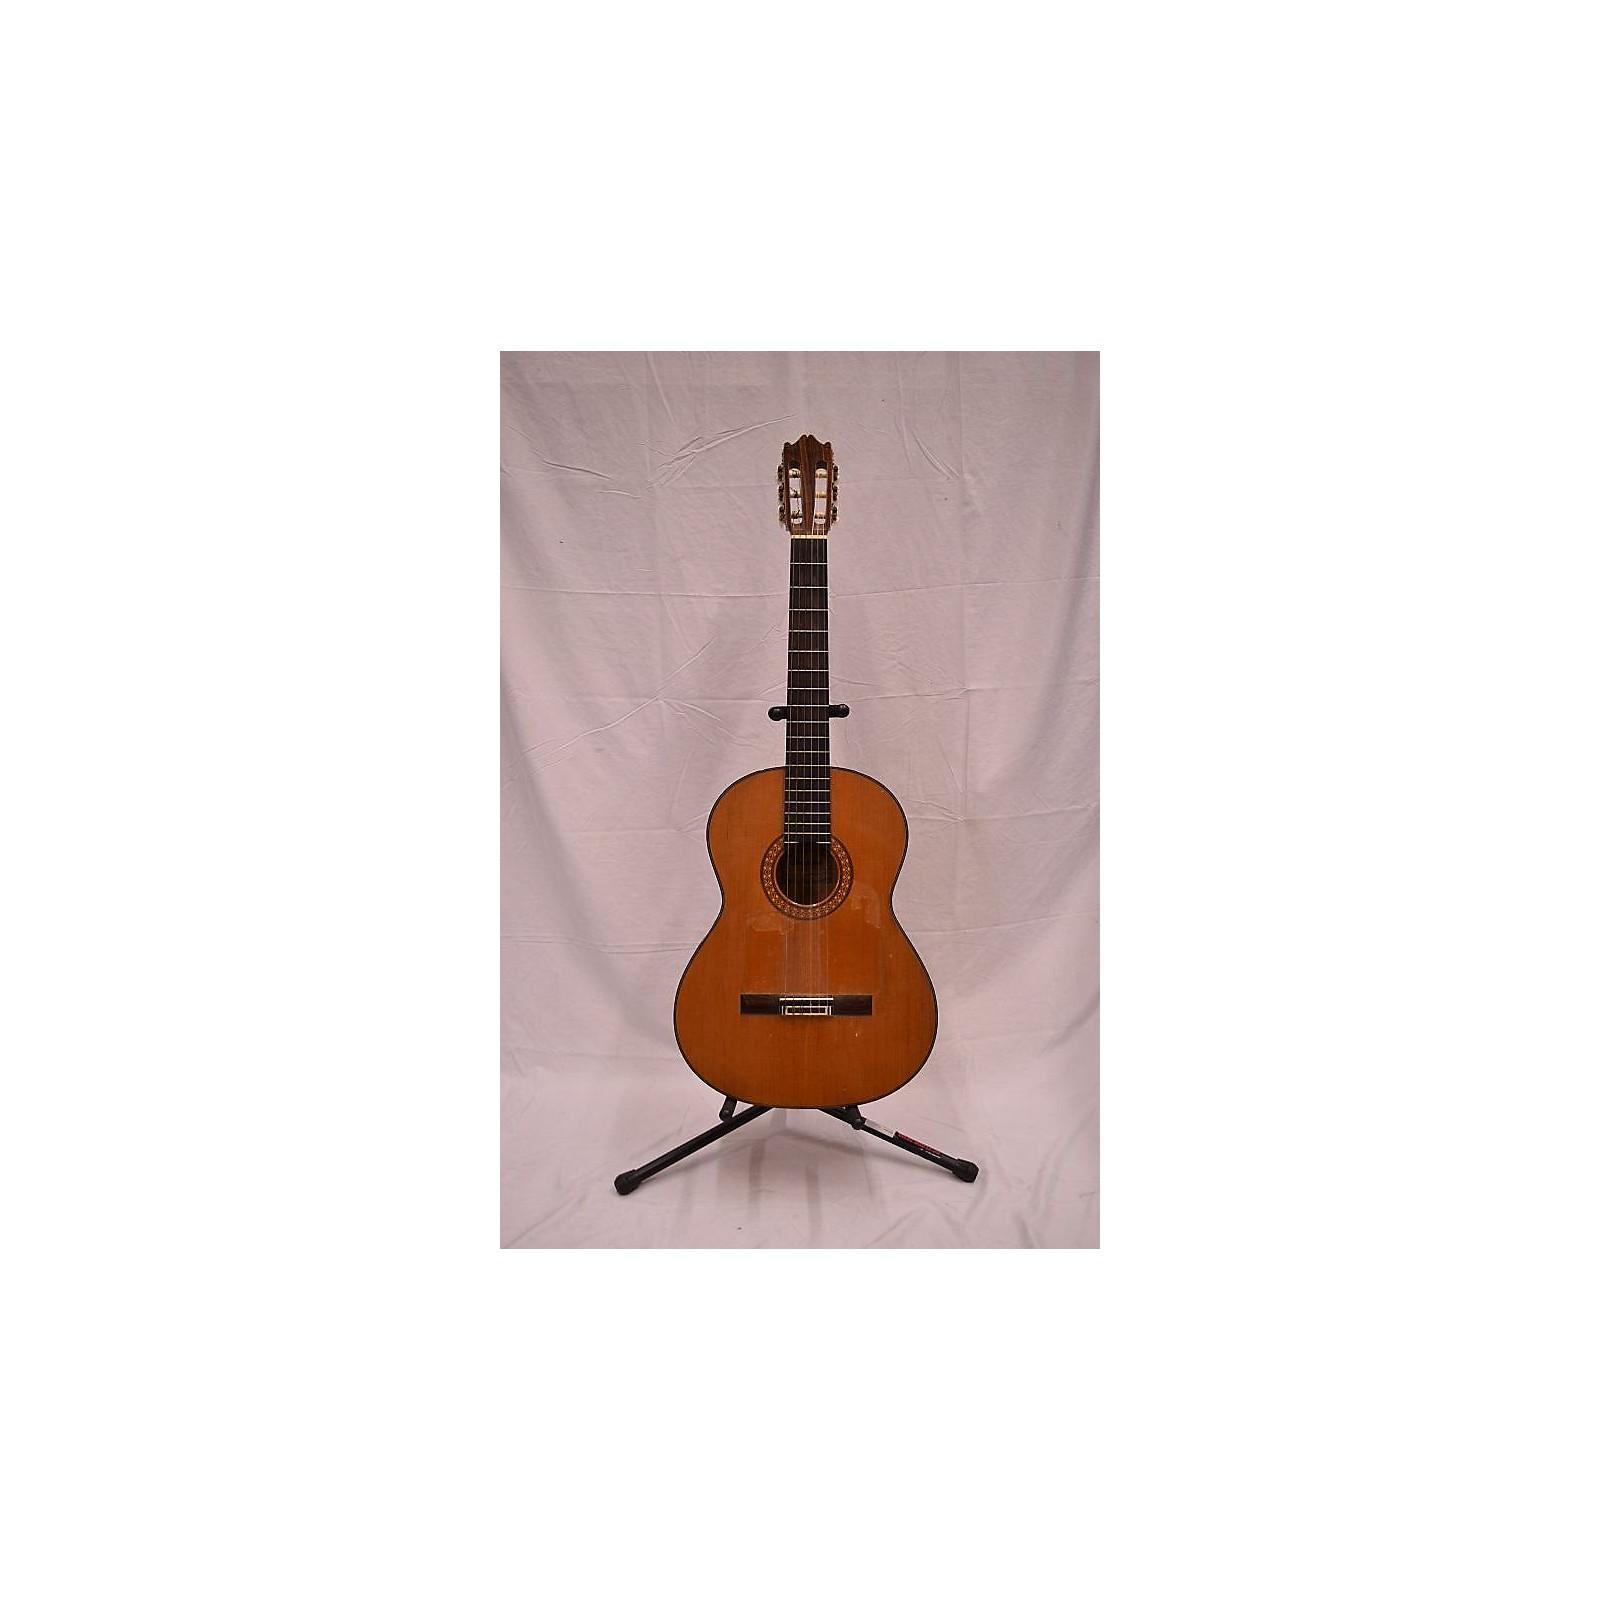 Ibanez 1990s GAF50 Classical Acoustic Guitar